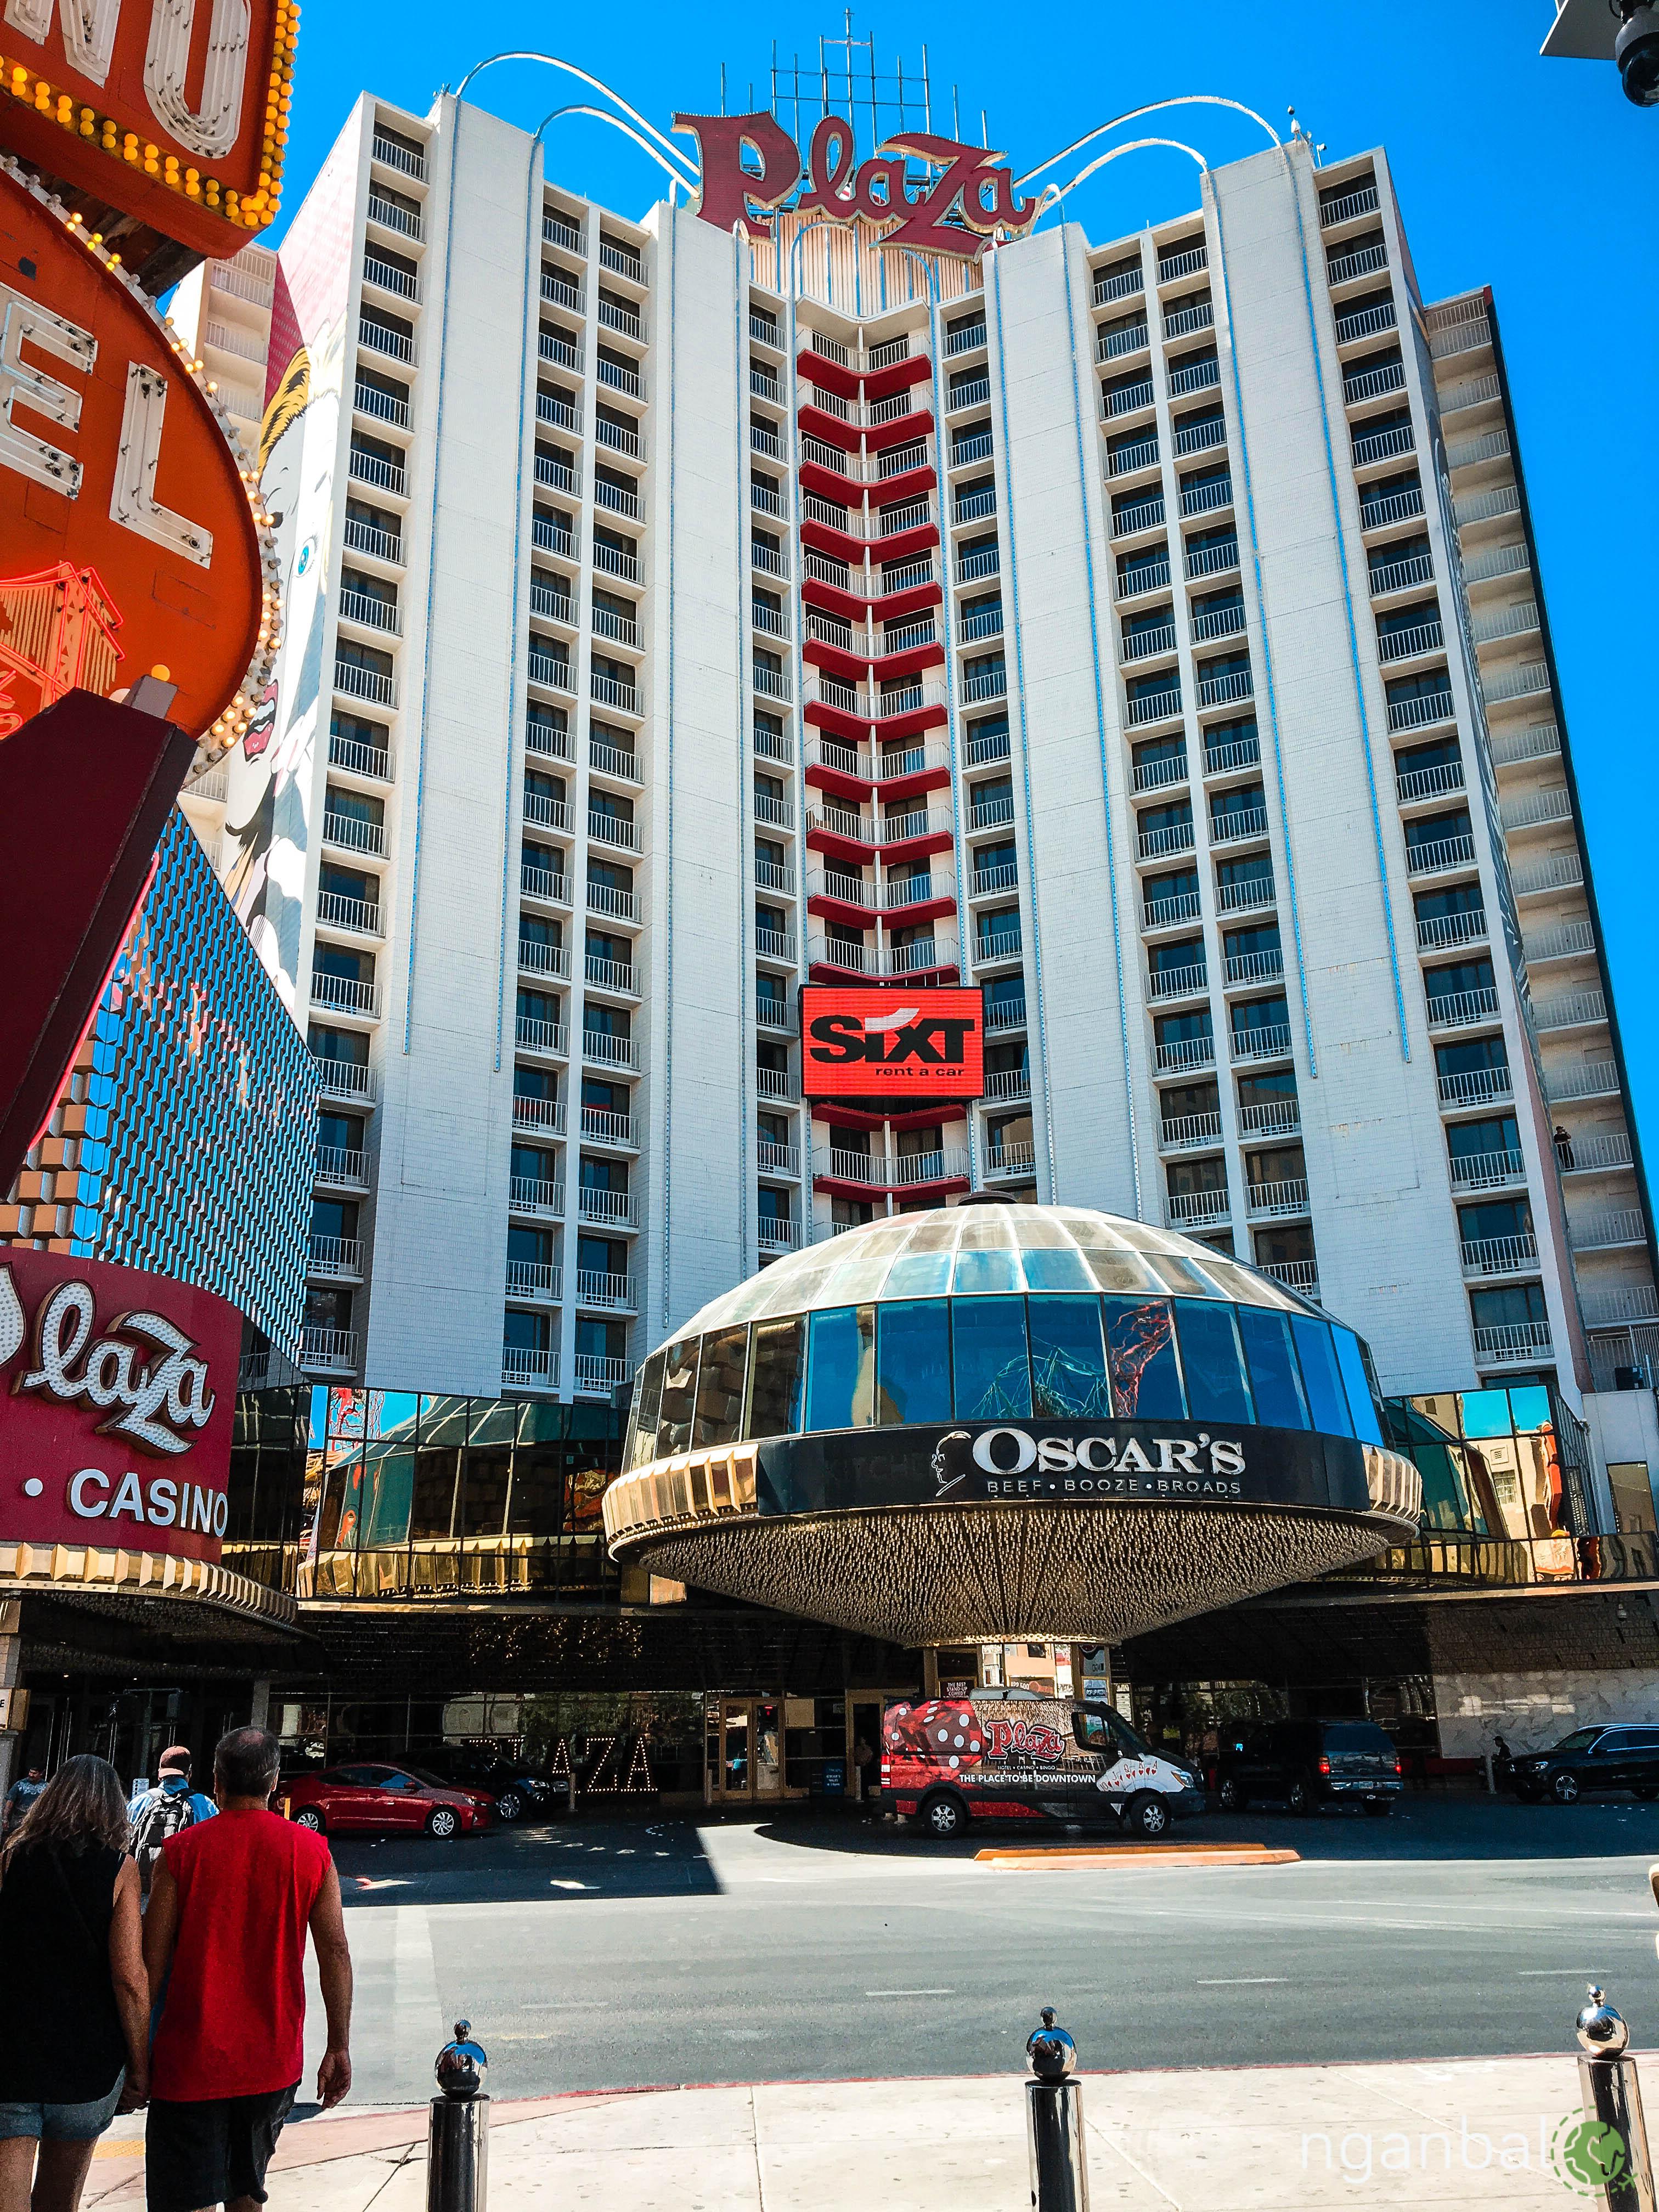 du lịch Las Vegas